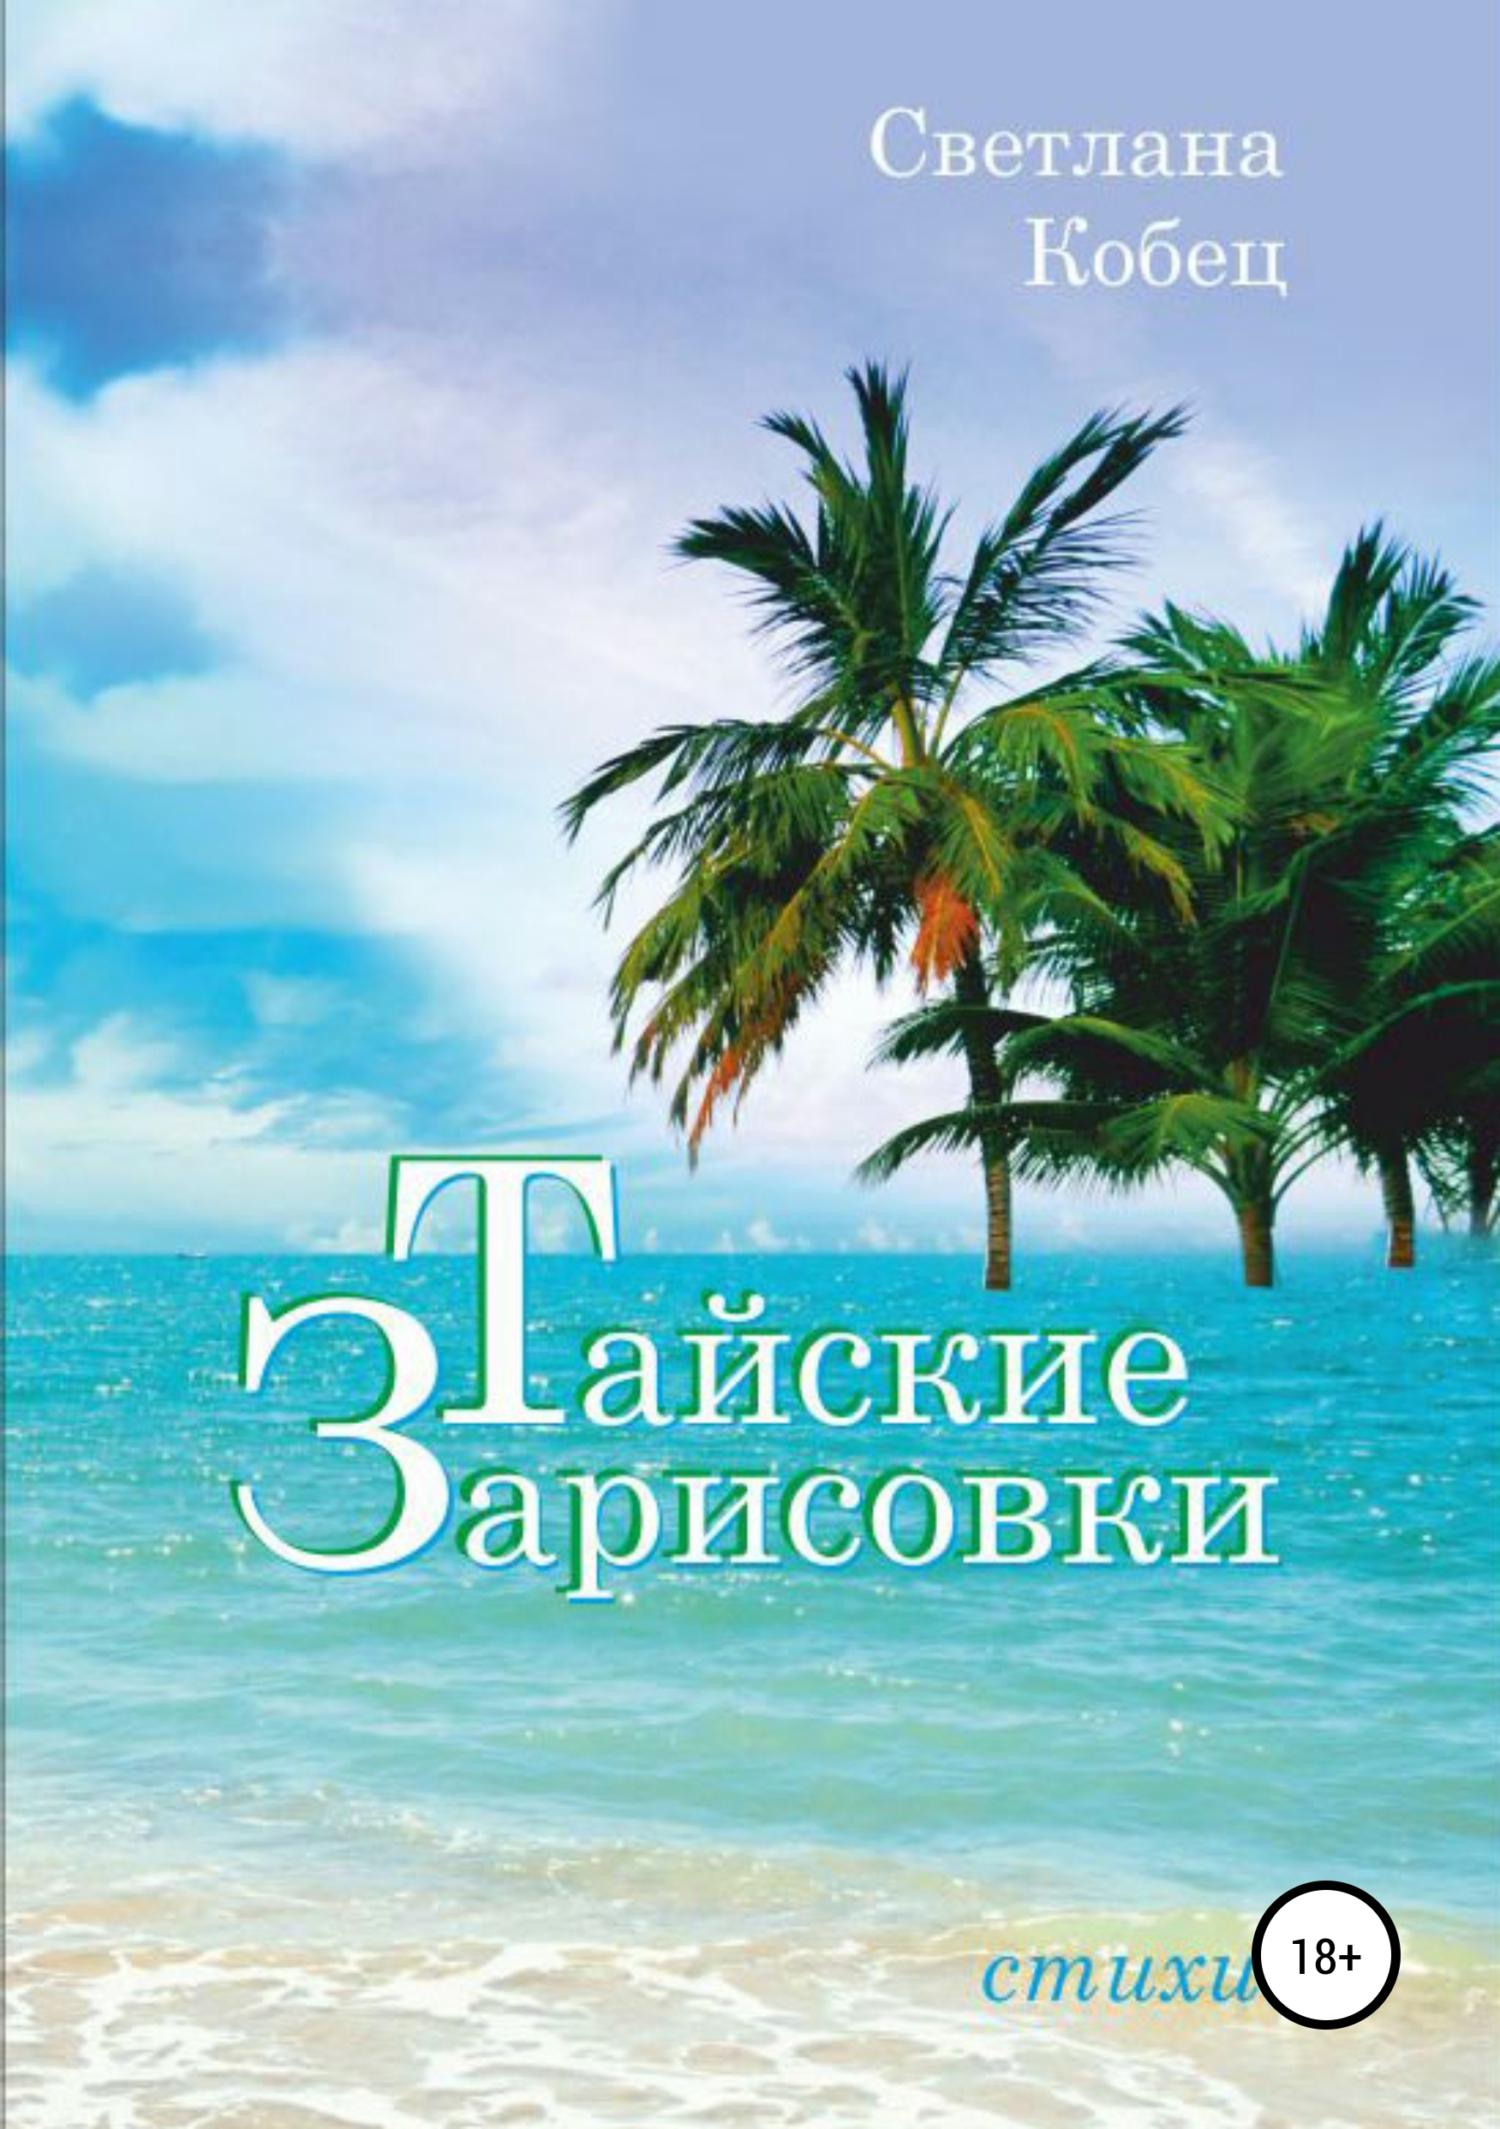 Светлана Викторовна Кобец «Тайские зарисовки»